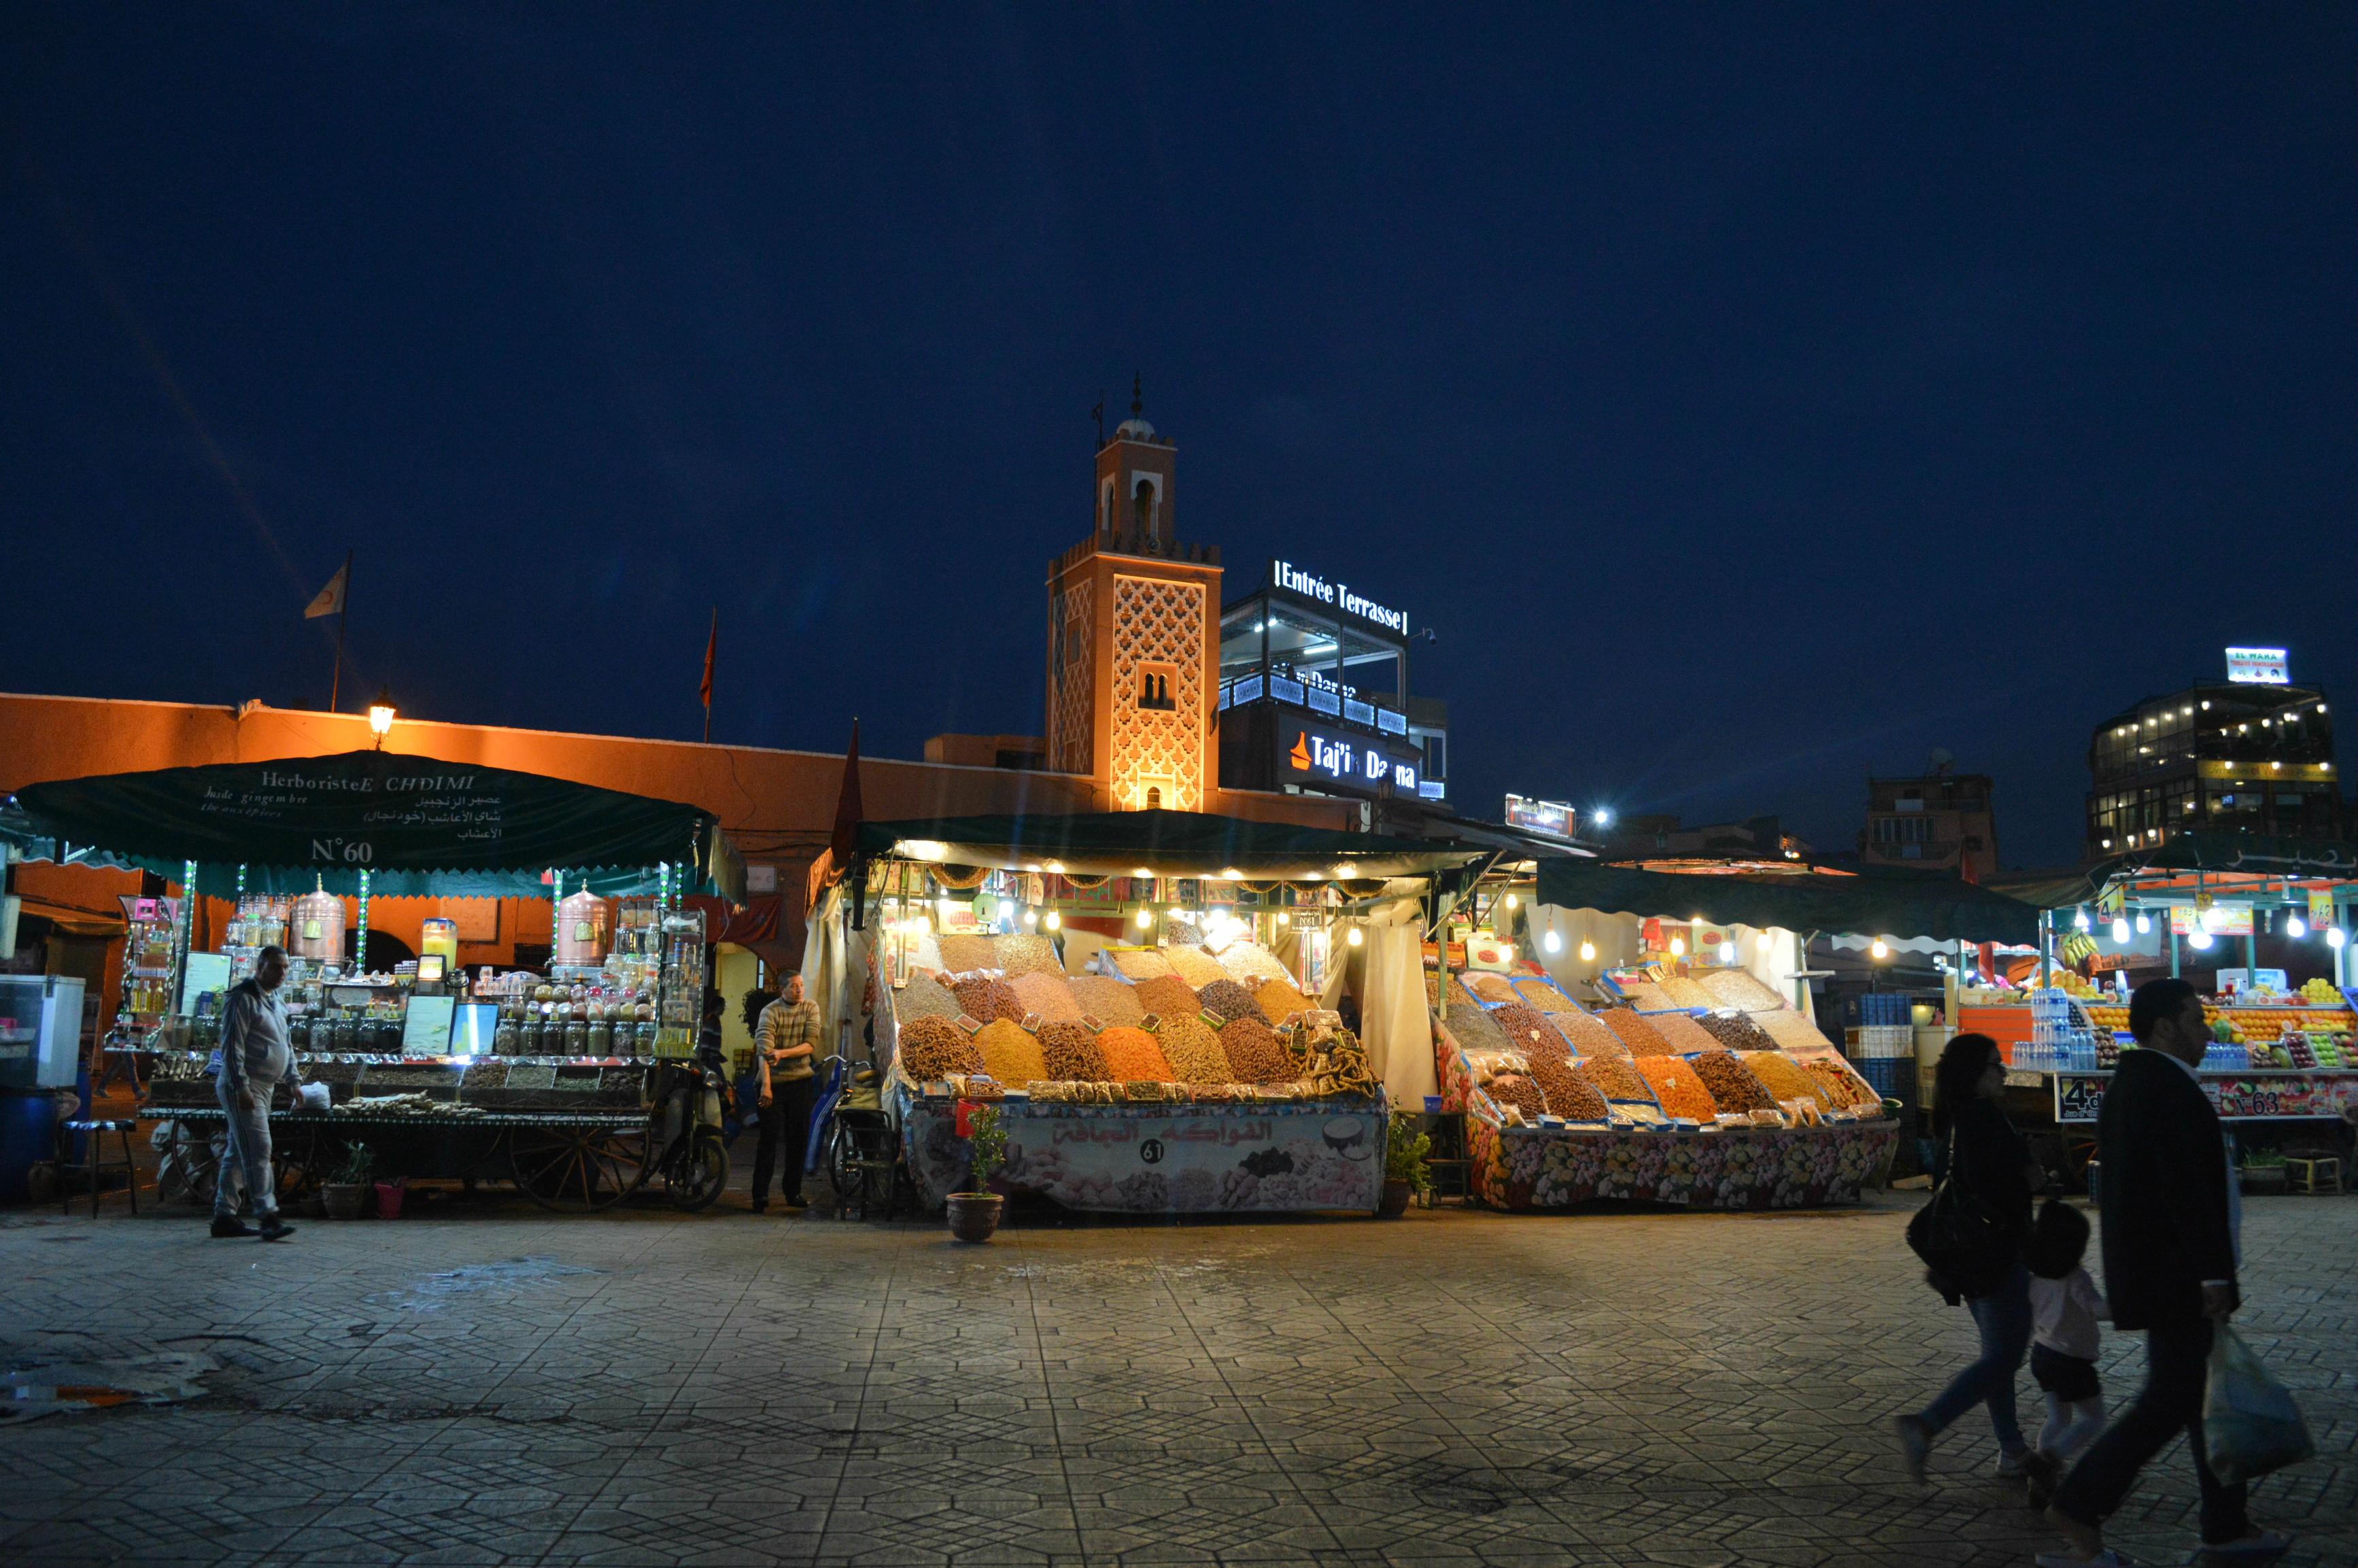 place jemaa el fna Marrakech Camille in Bordeaux